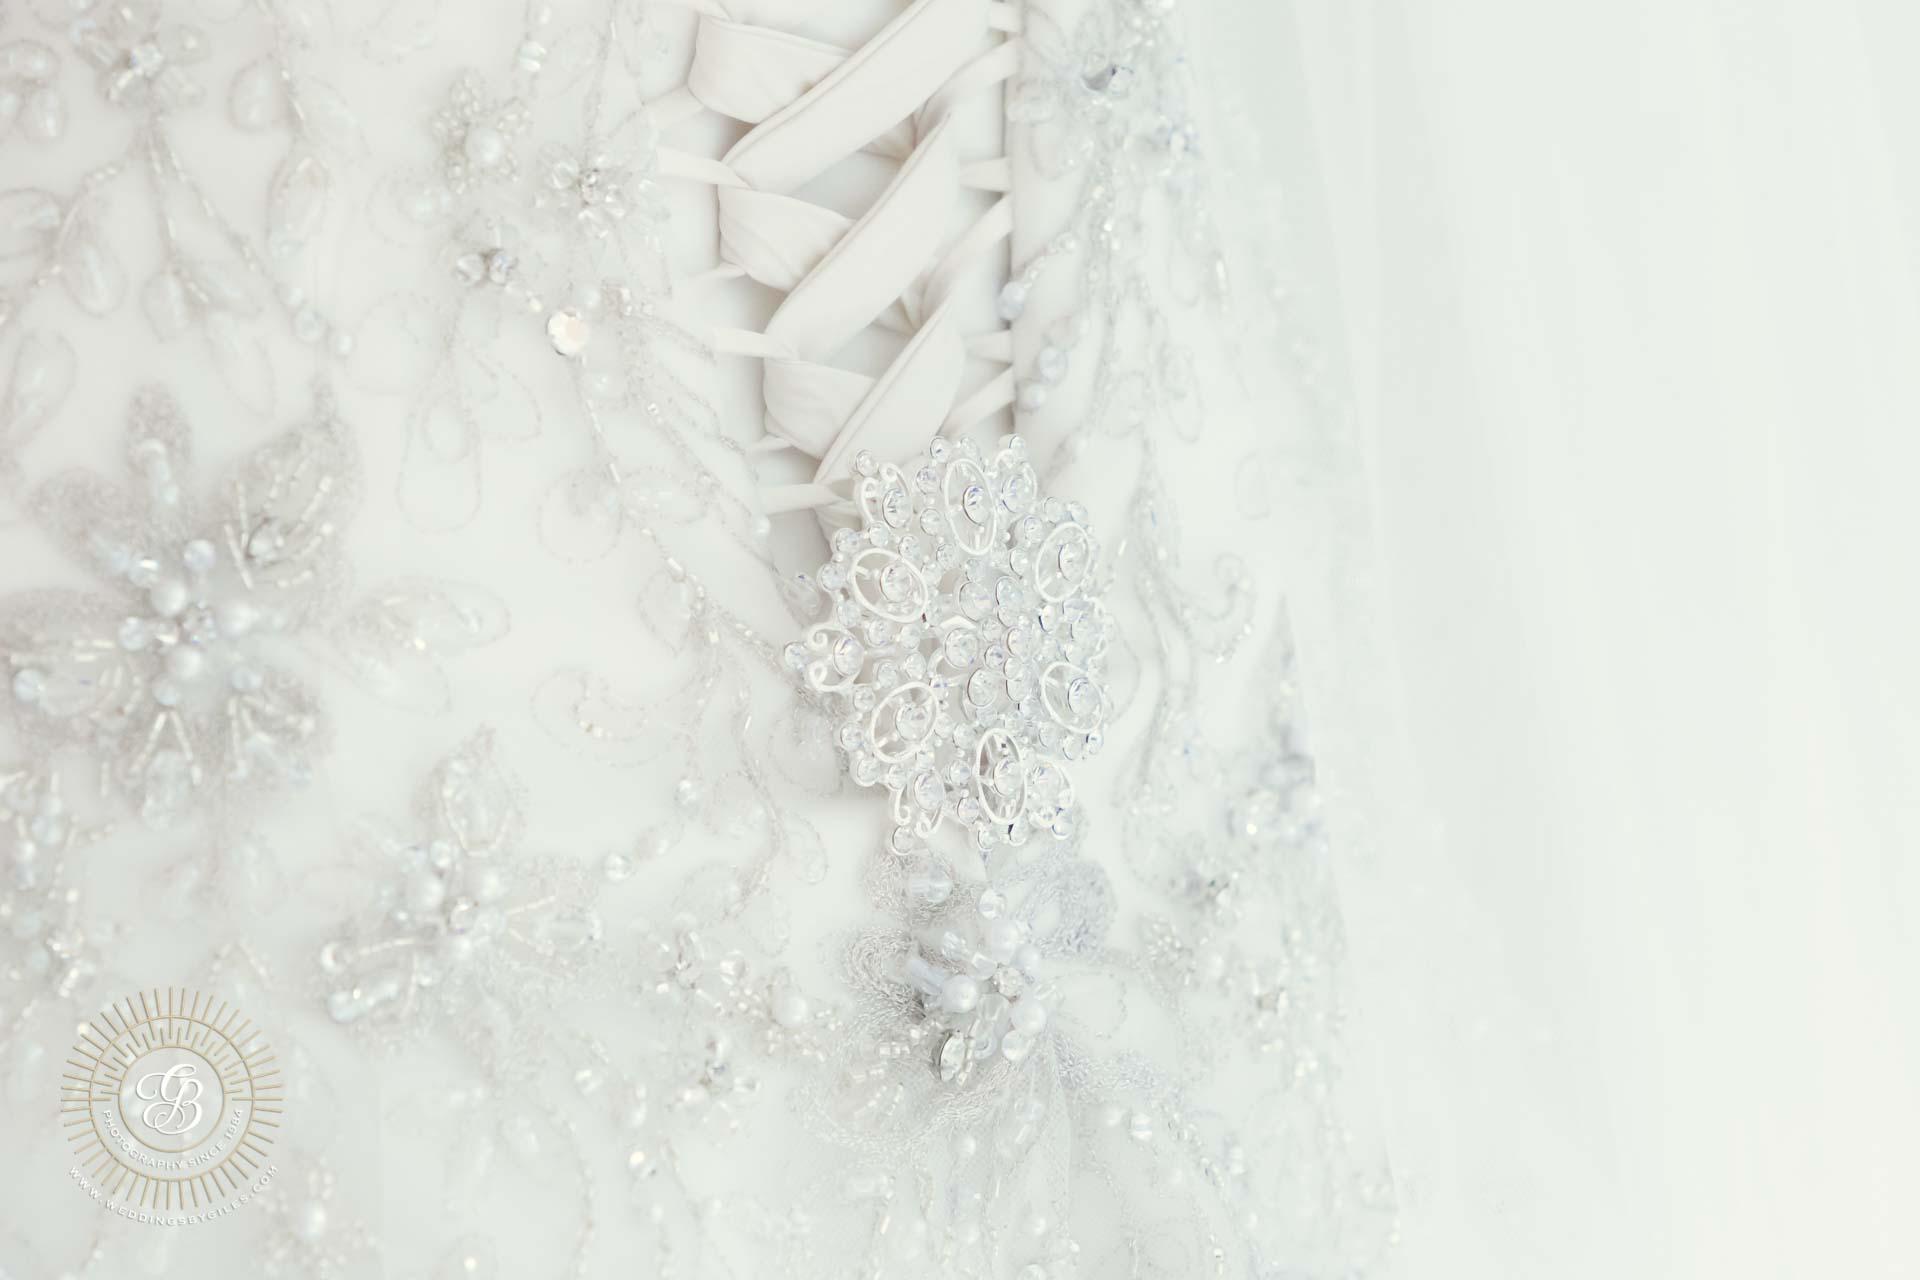 wedding dress pin